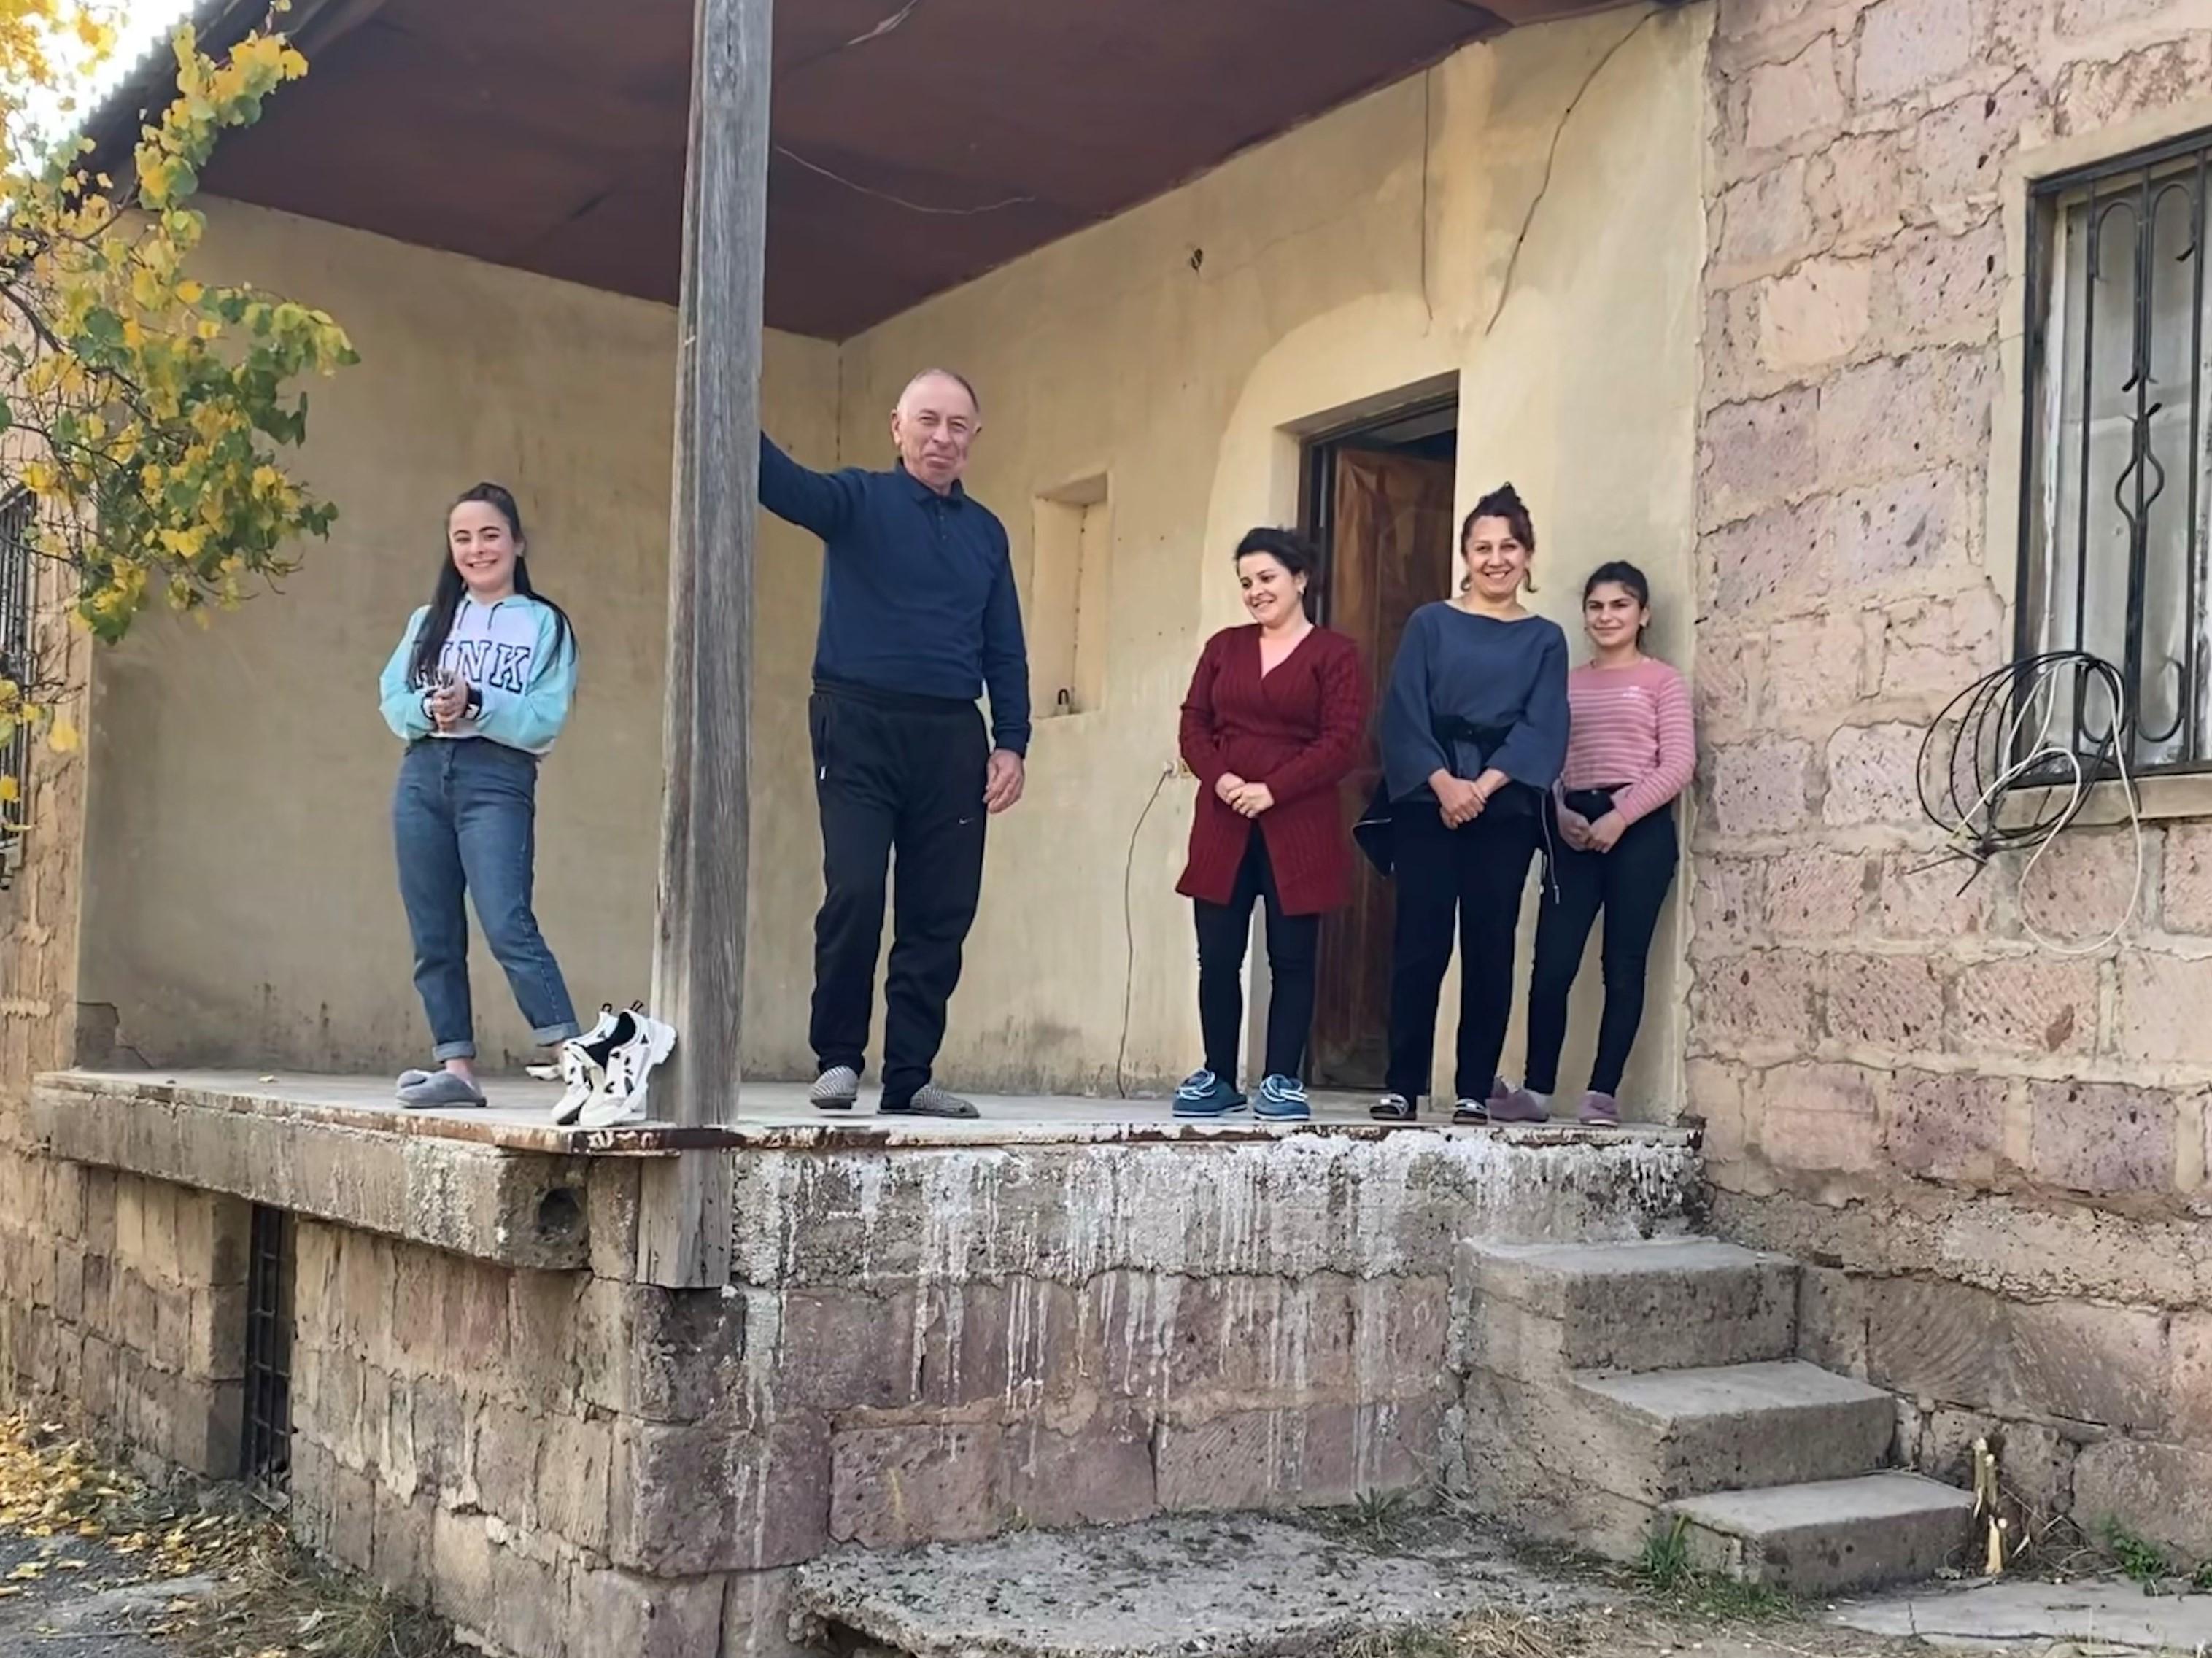 The Poghosyan family. Photo: Dvin Titizian/OC Media.